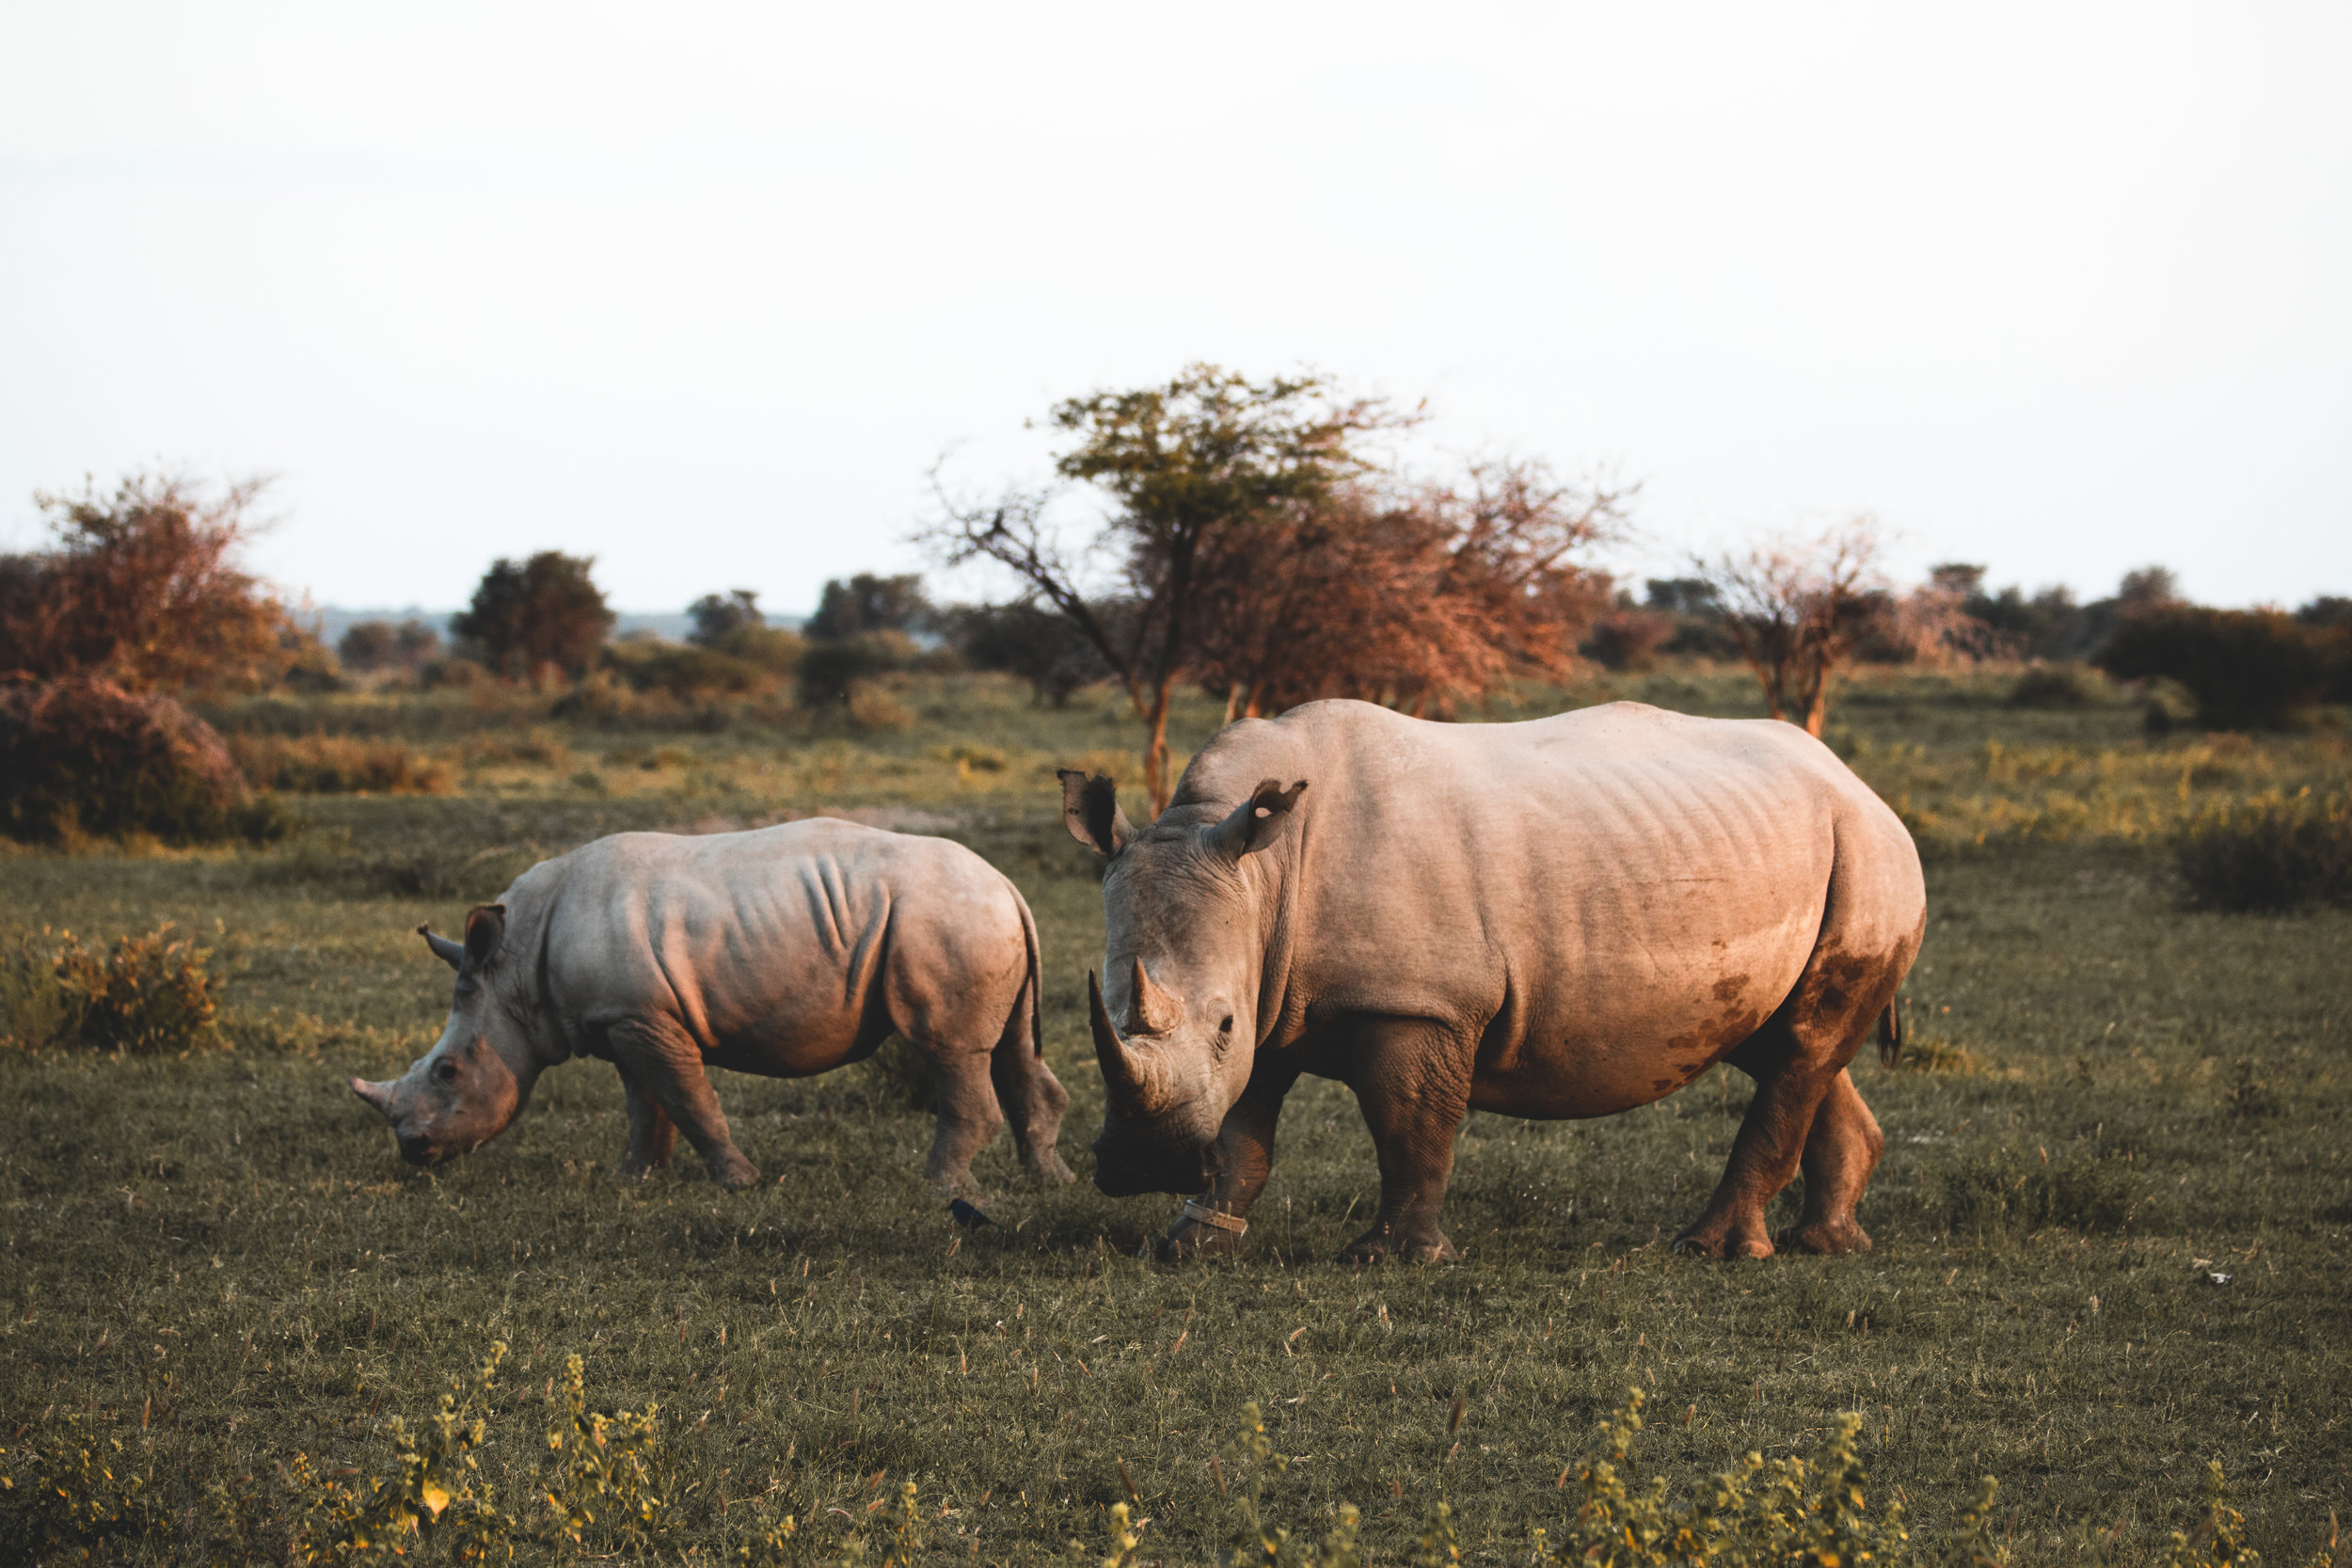 Mom and baby at Khama Rhino Sanctuary, Botswana.